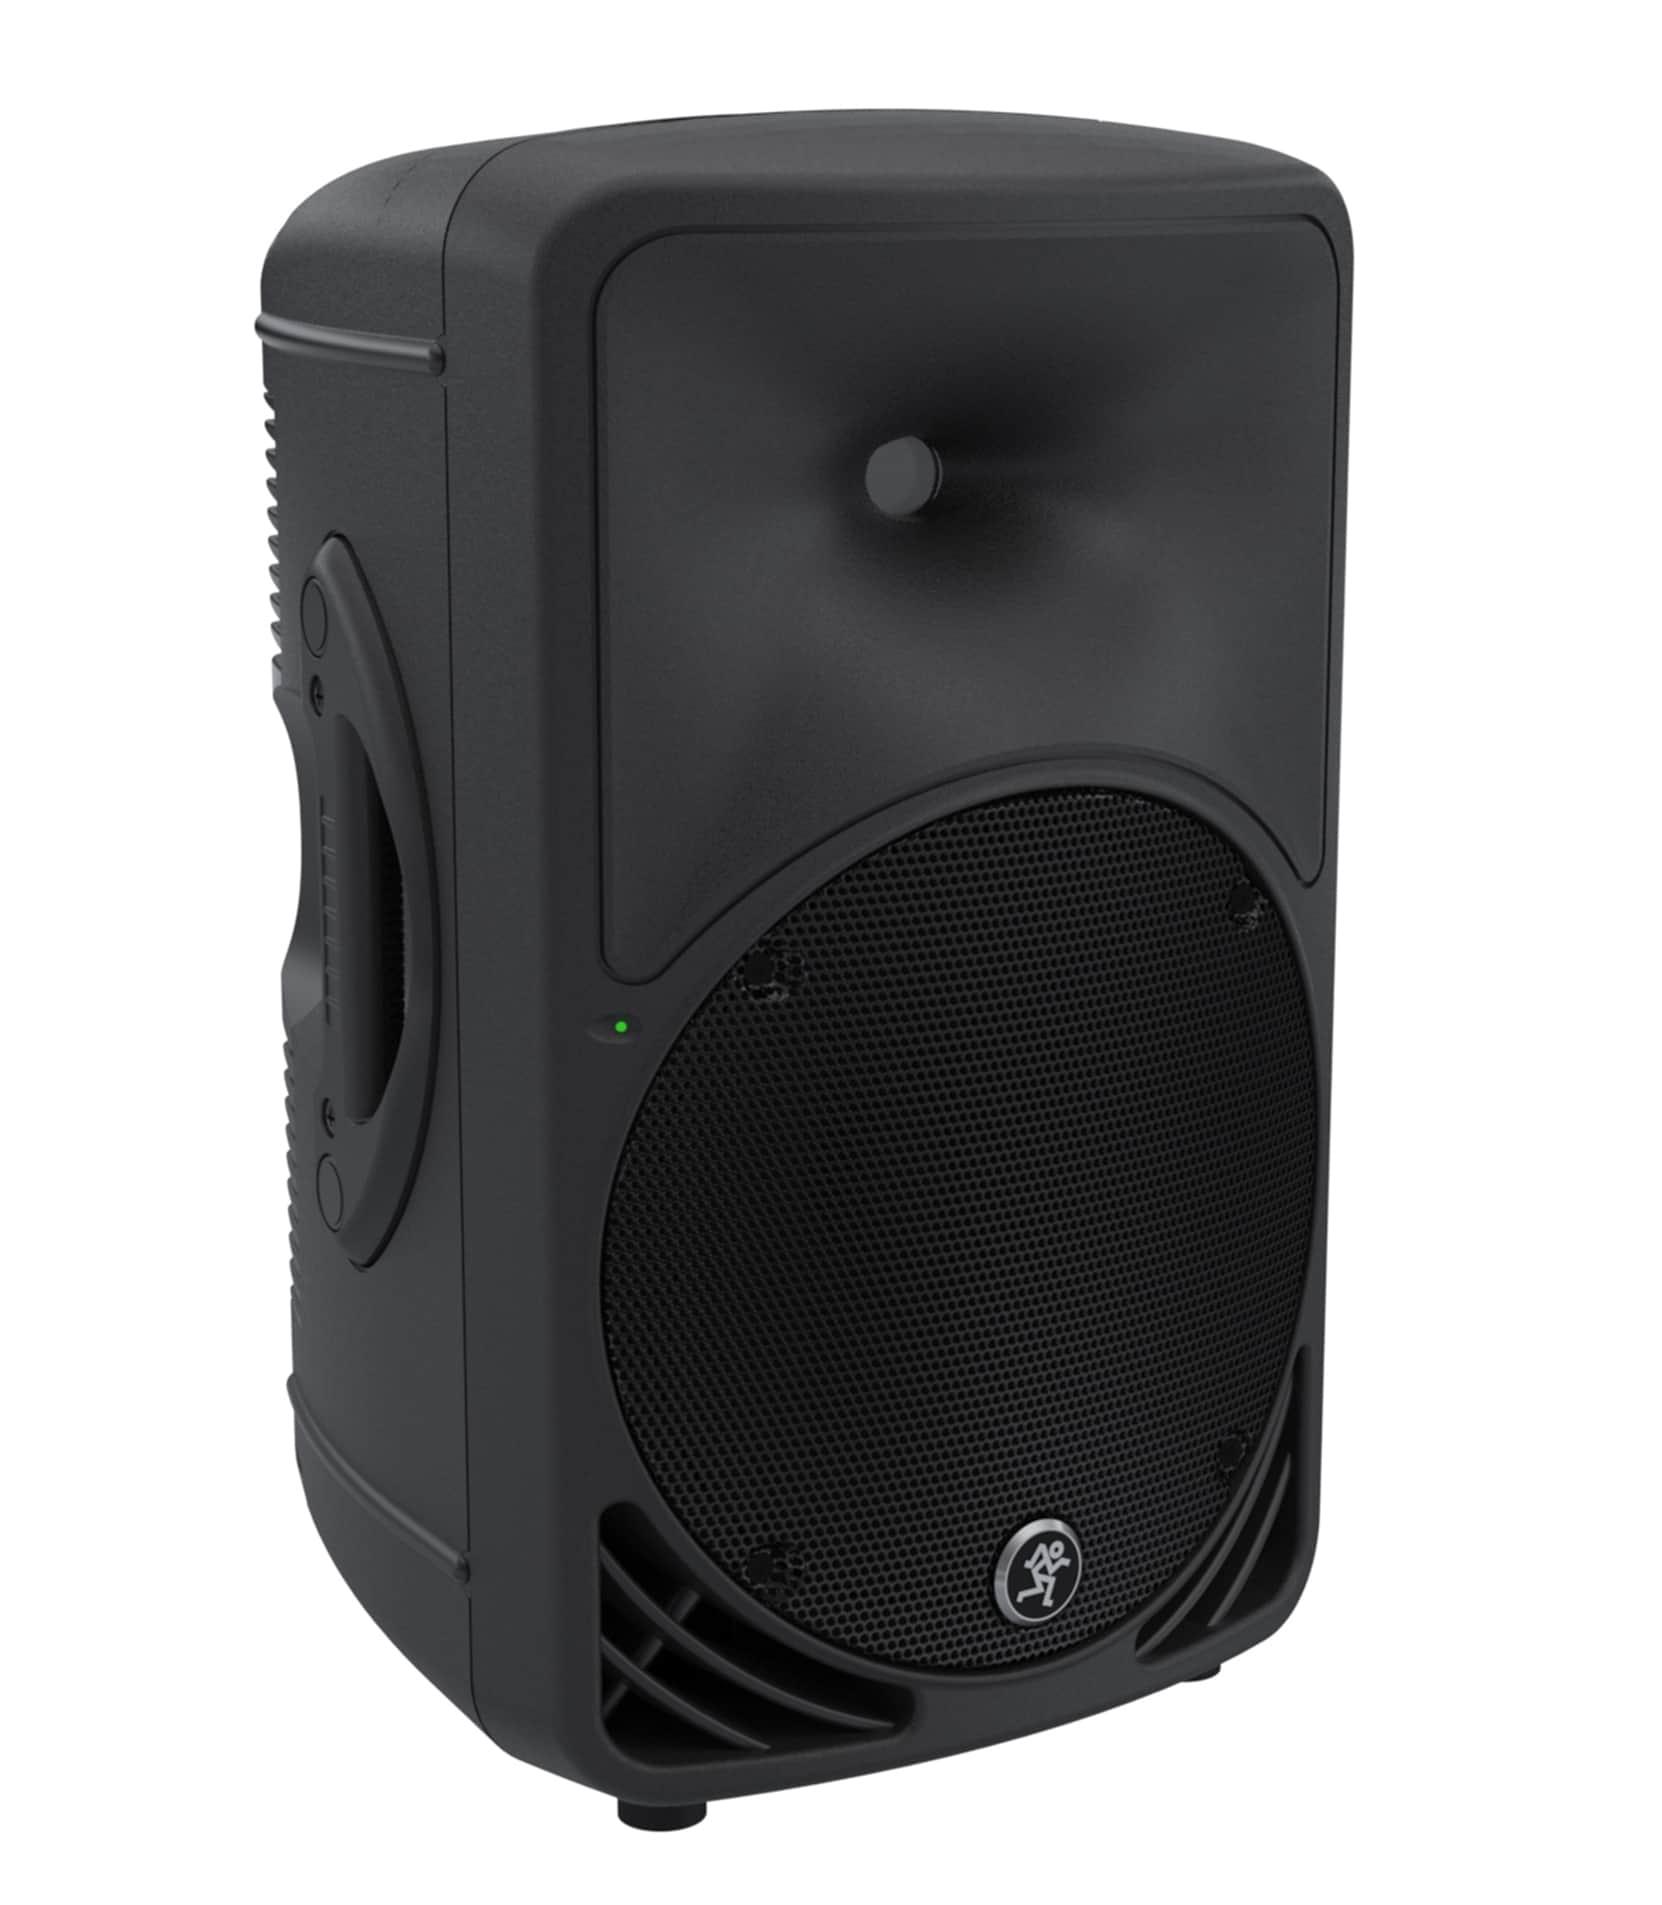 SRM350v3 Portable Loudspeaker - Buy Online